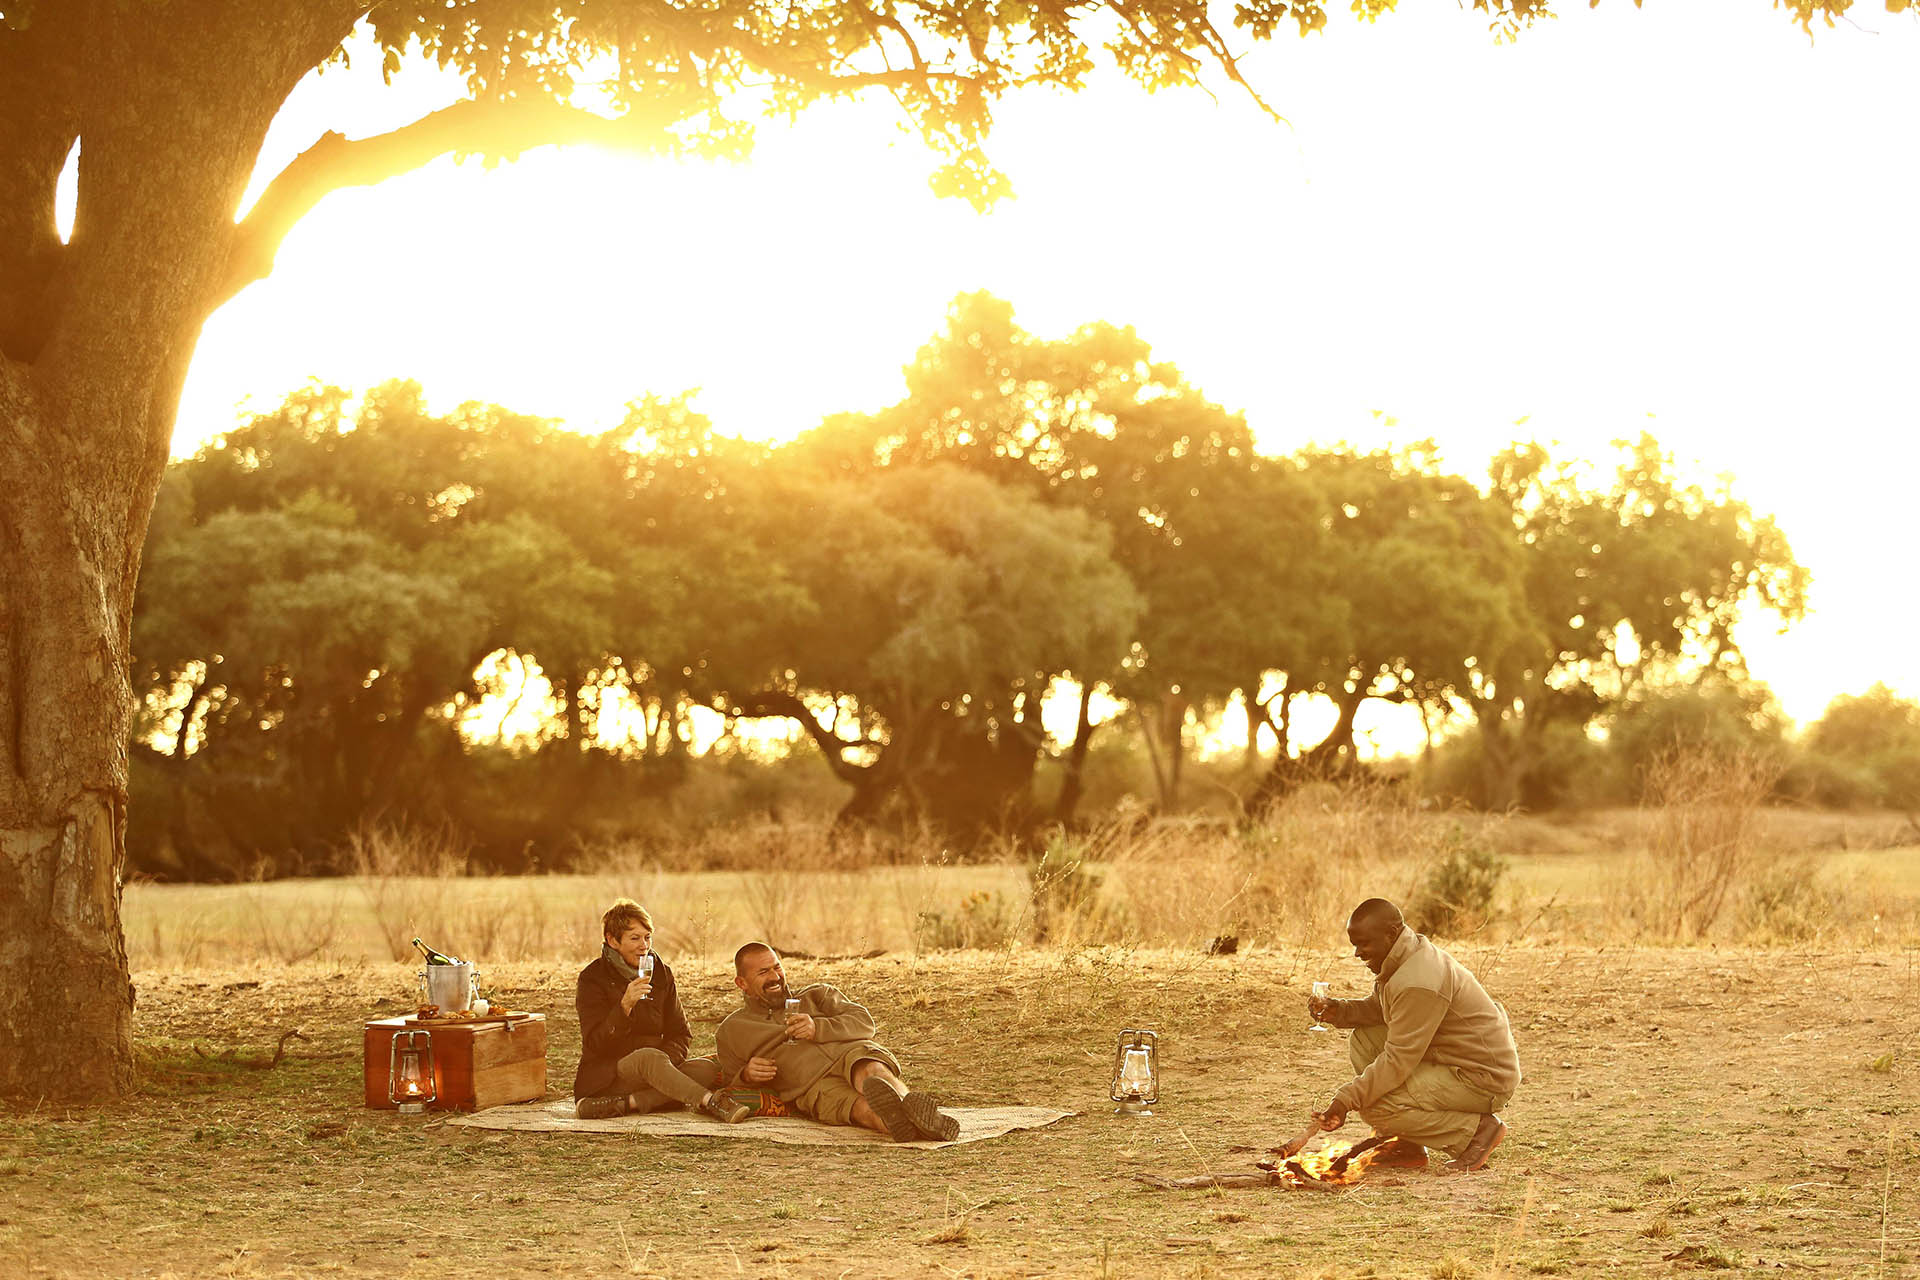 lake malawi national park malawi-national-parks-reserves-malawian-style-malawi-adventures-experiences-specialist-tour-operator-malawi-zambia-honeymoon-package-honeymoon